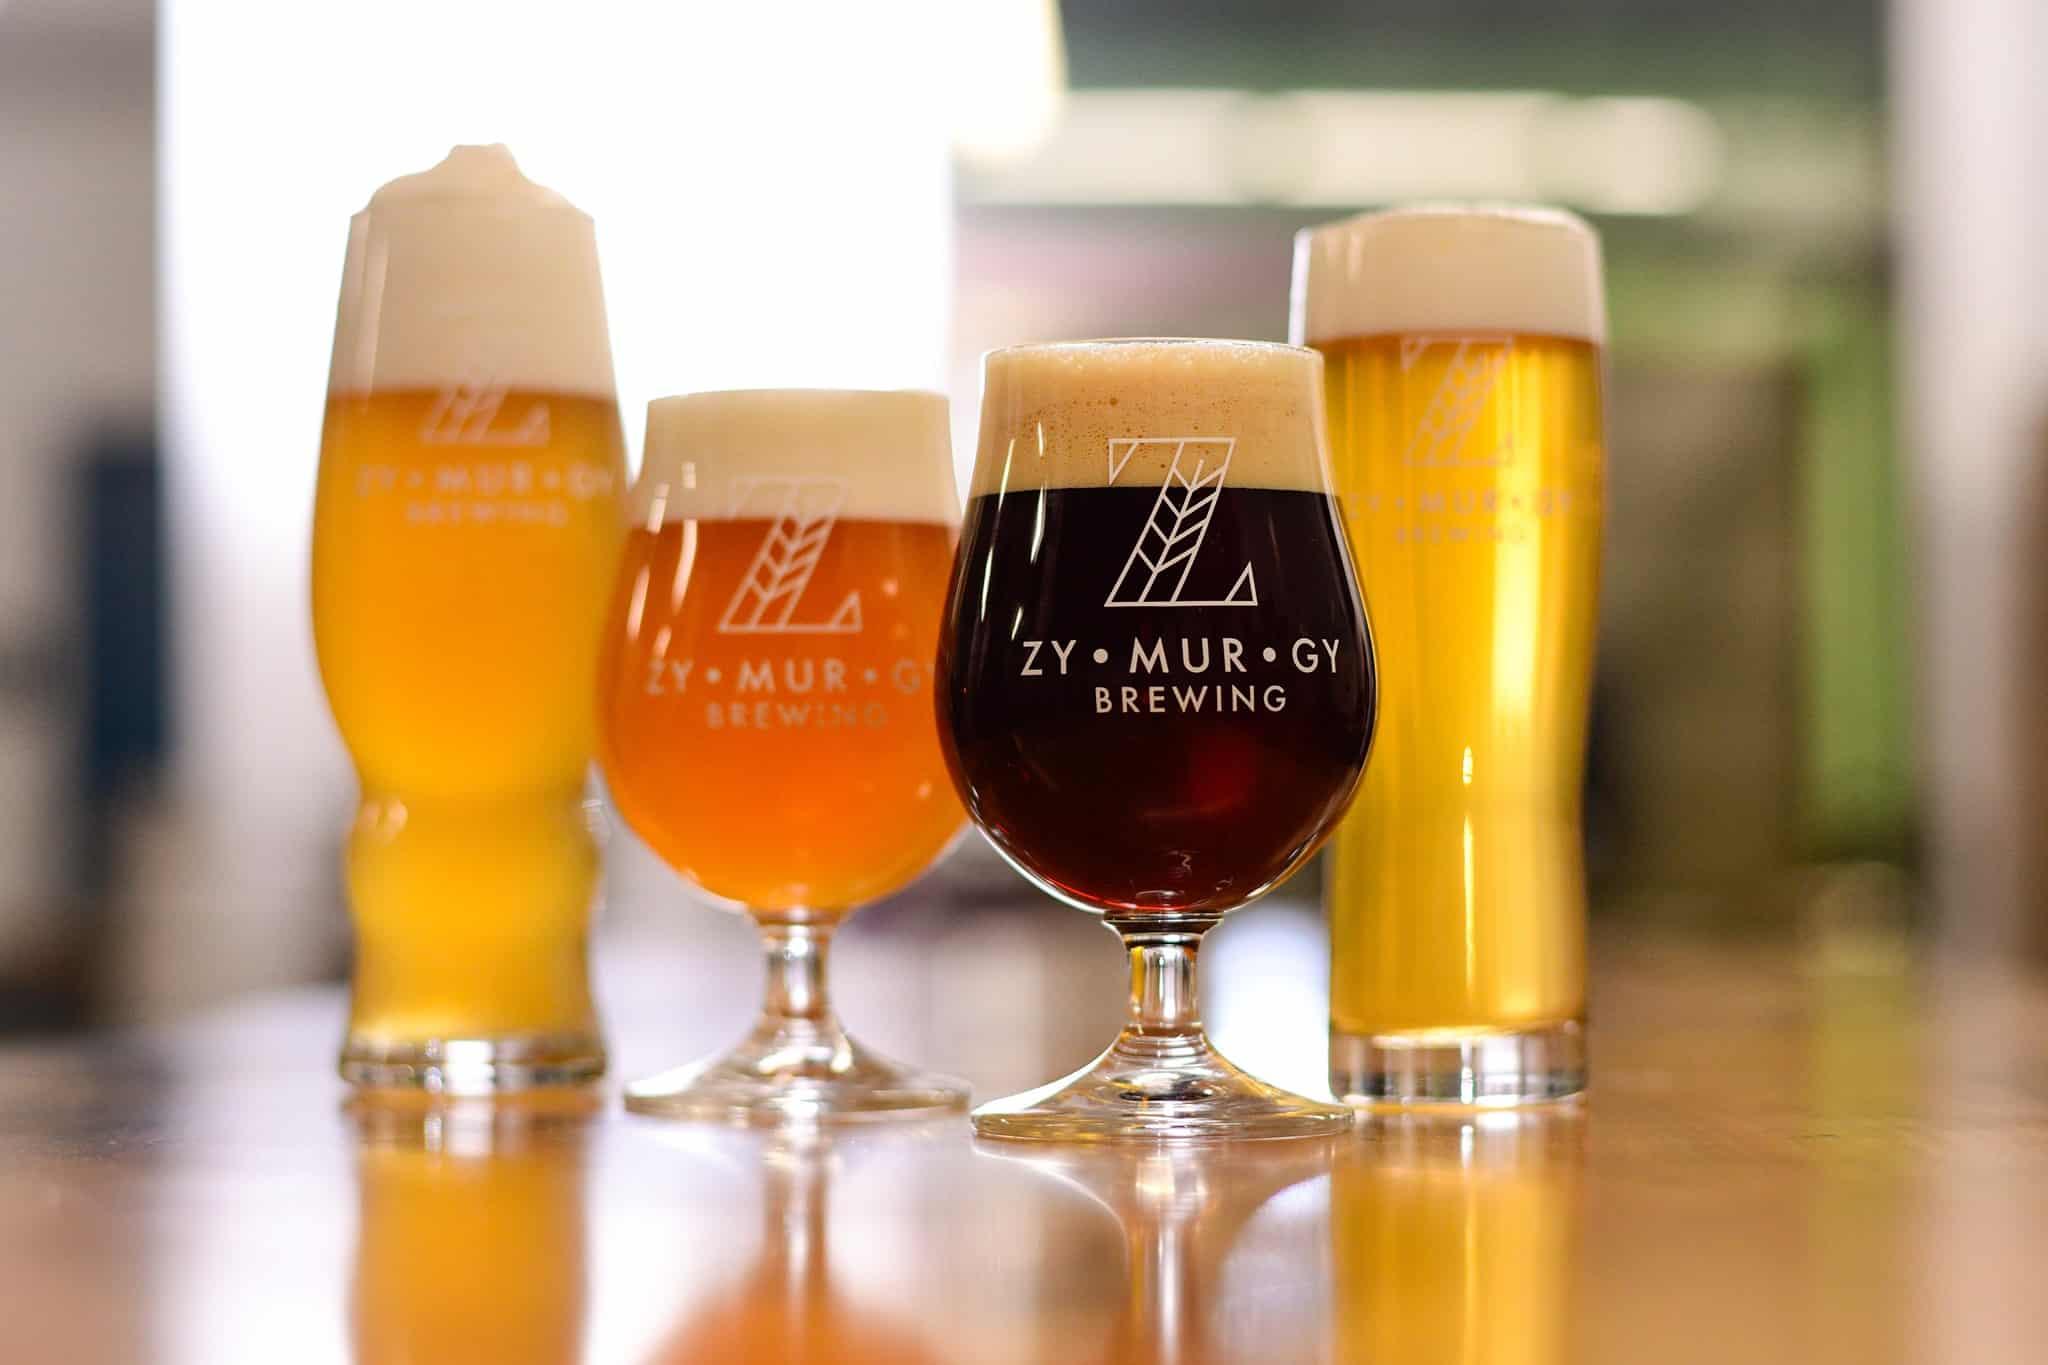 Zymurgy Brewing Co.